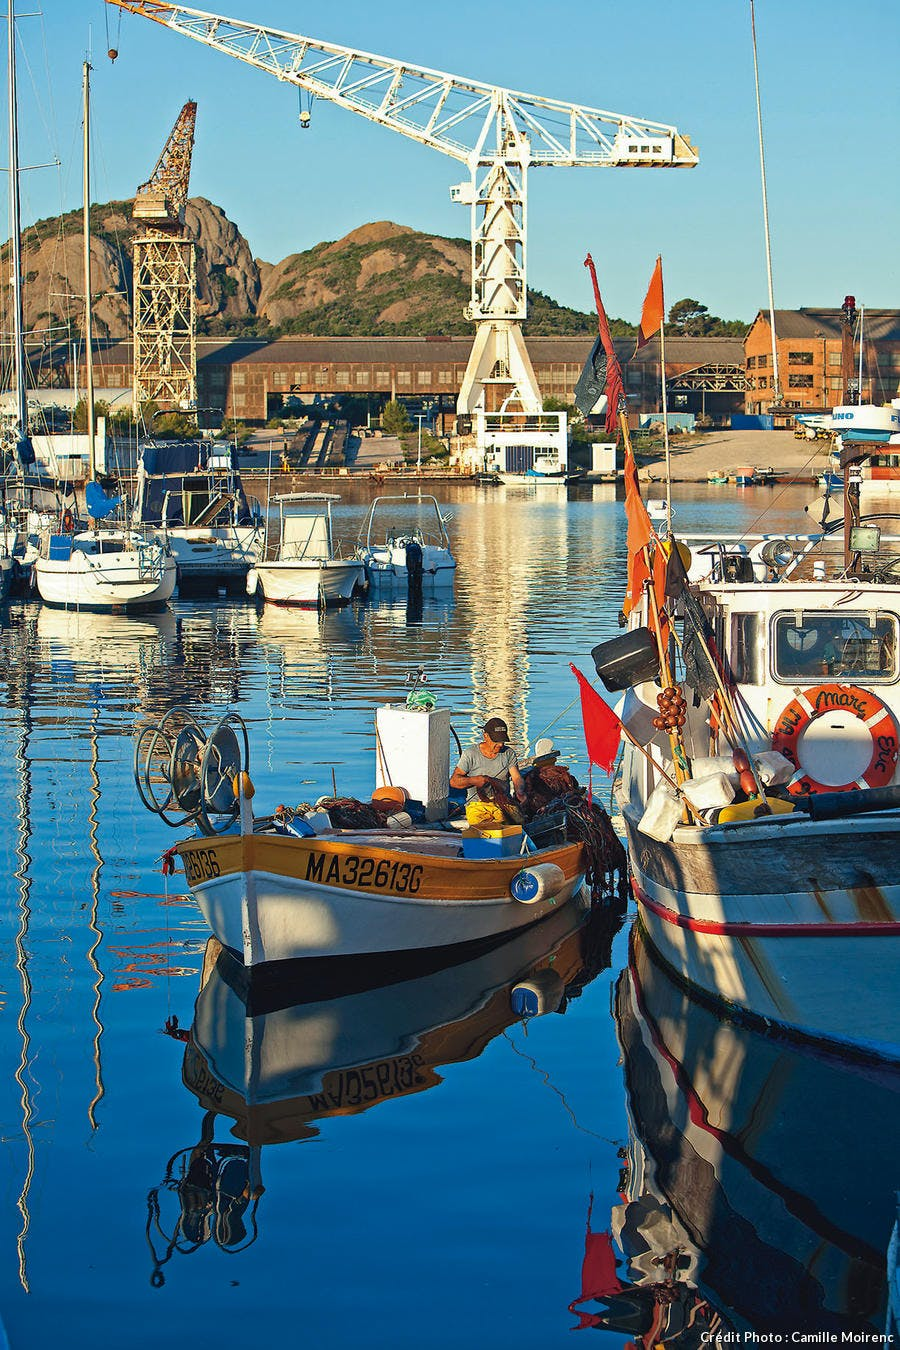 Embarcation de pêcheur dans le port de La Ciotat